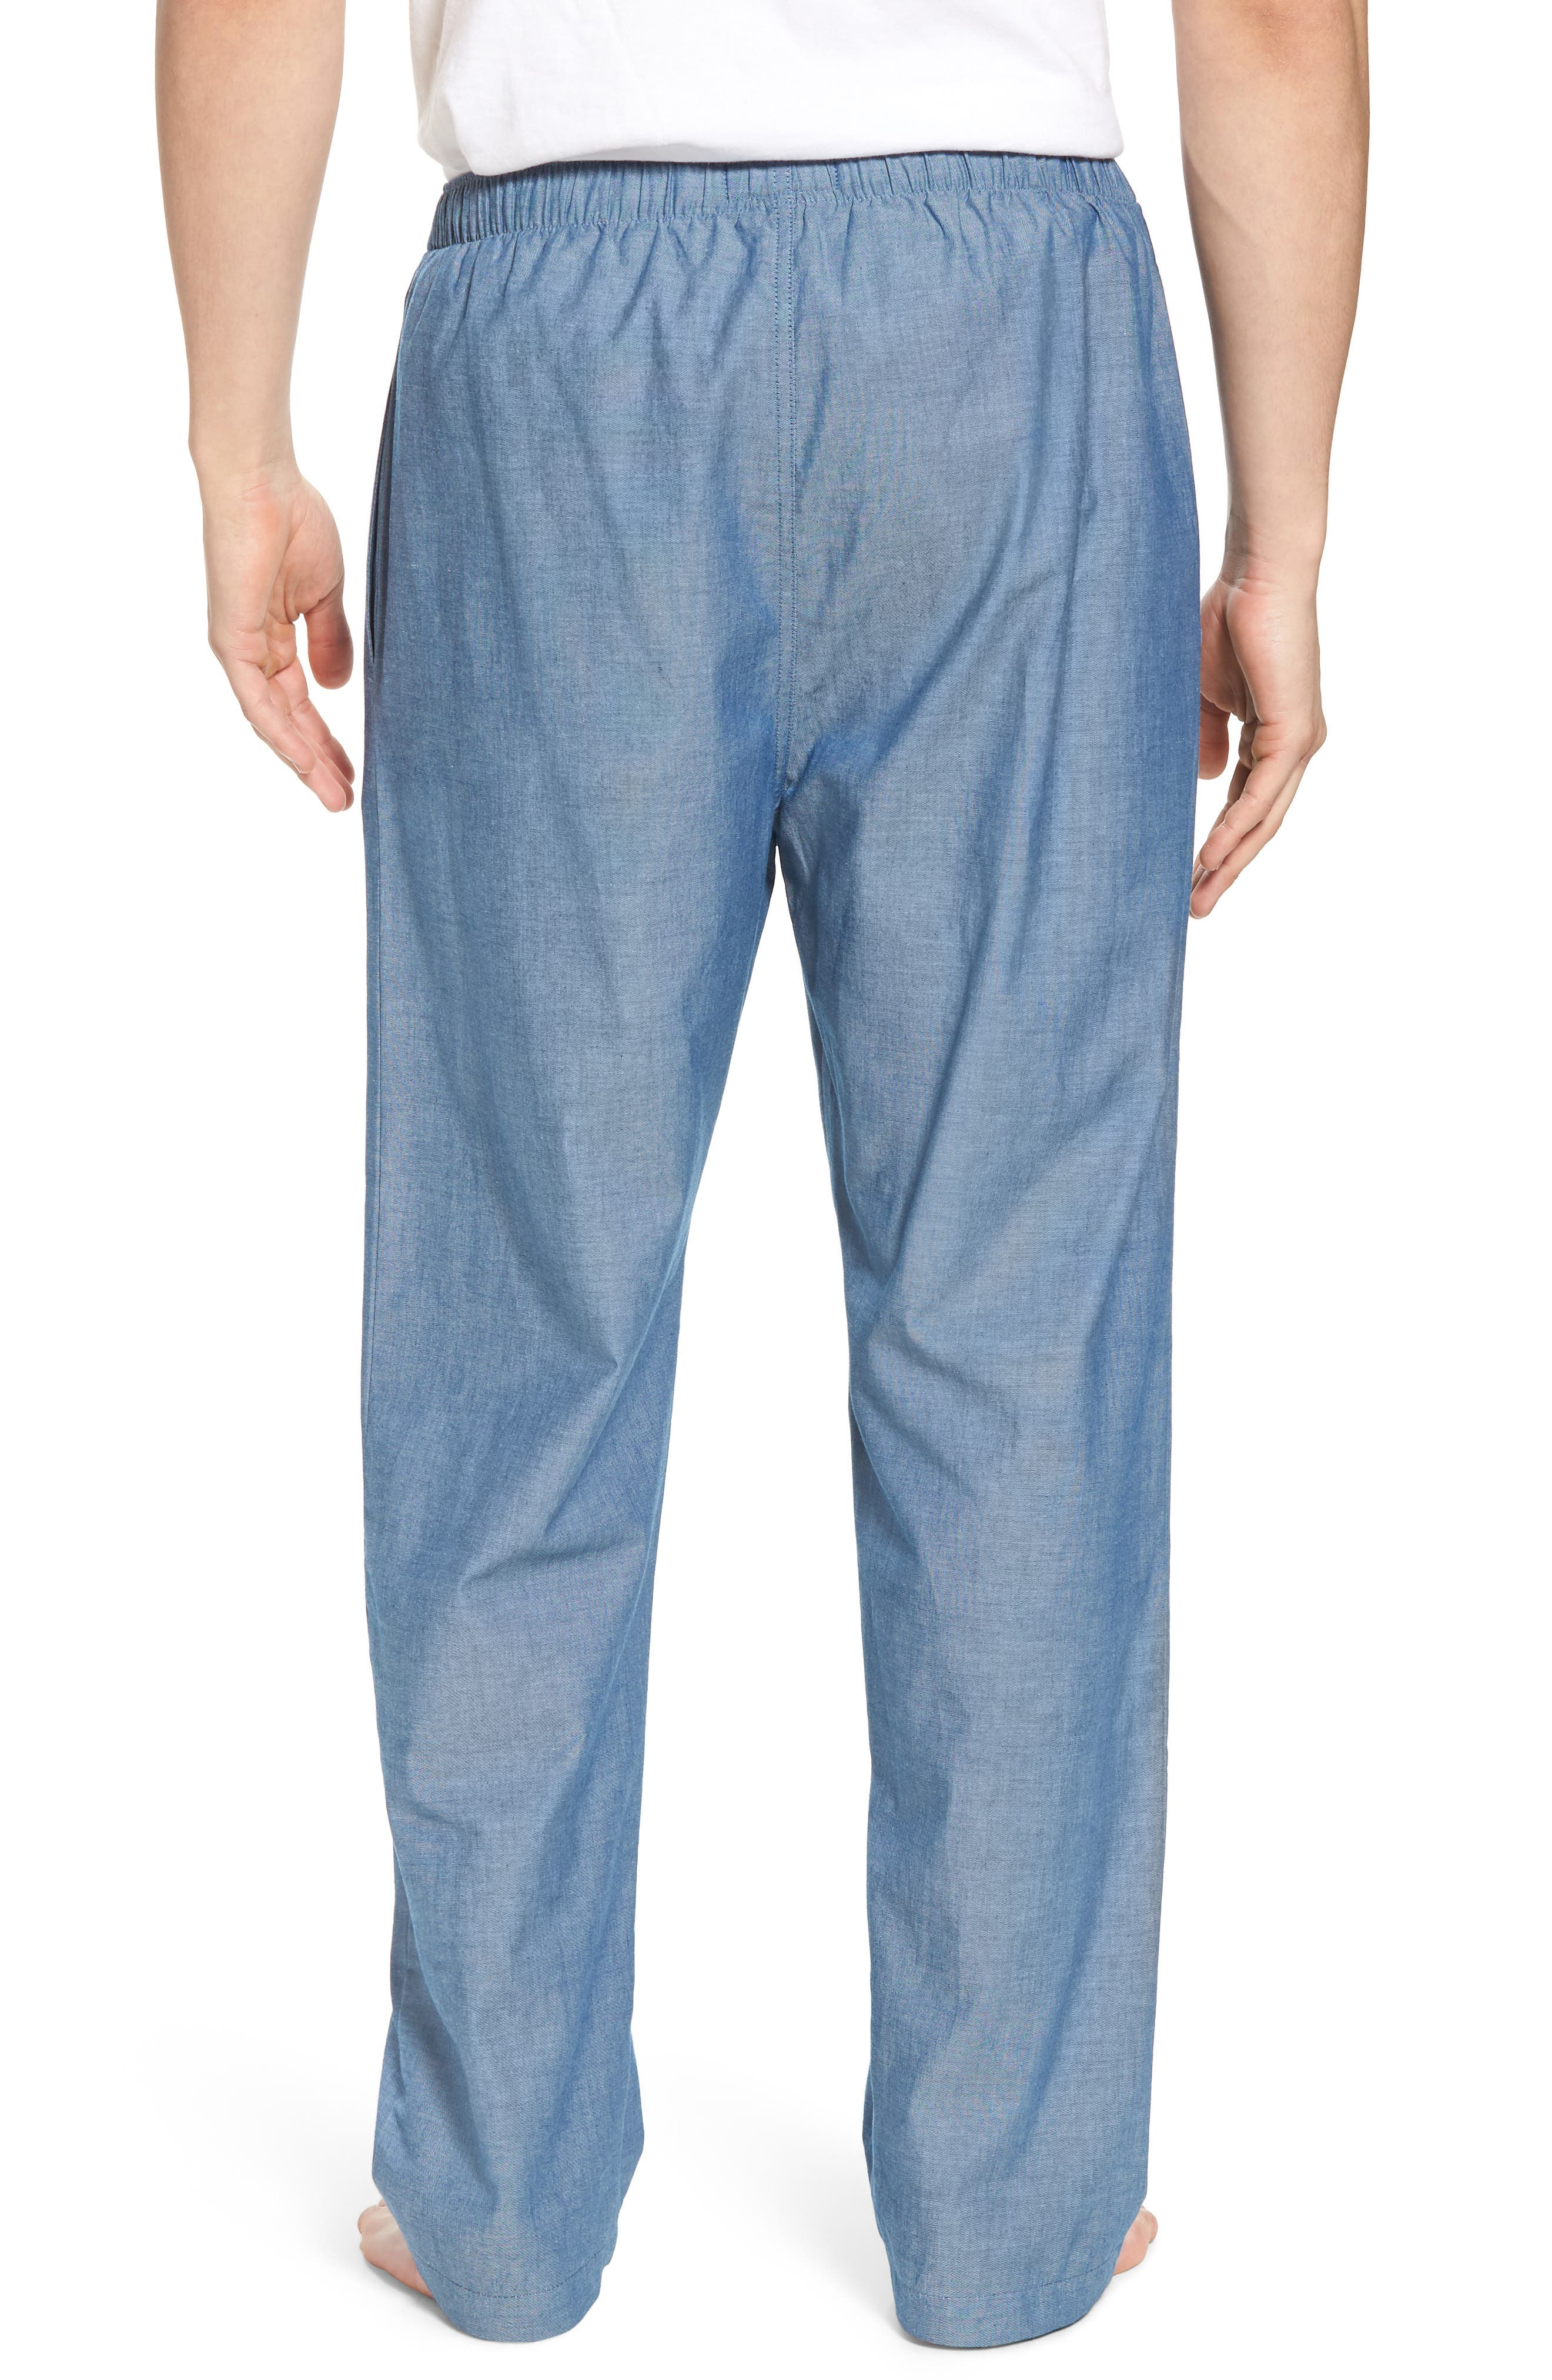 Chambray Woven Lounge Pants,                             Alternate thumbnail 2, color,                             Medium Indigo/ Dark Indigo